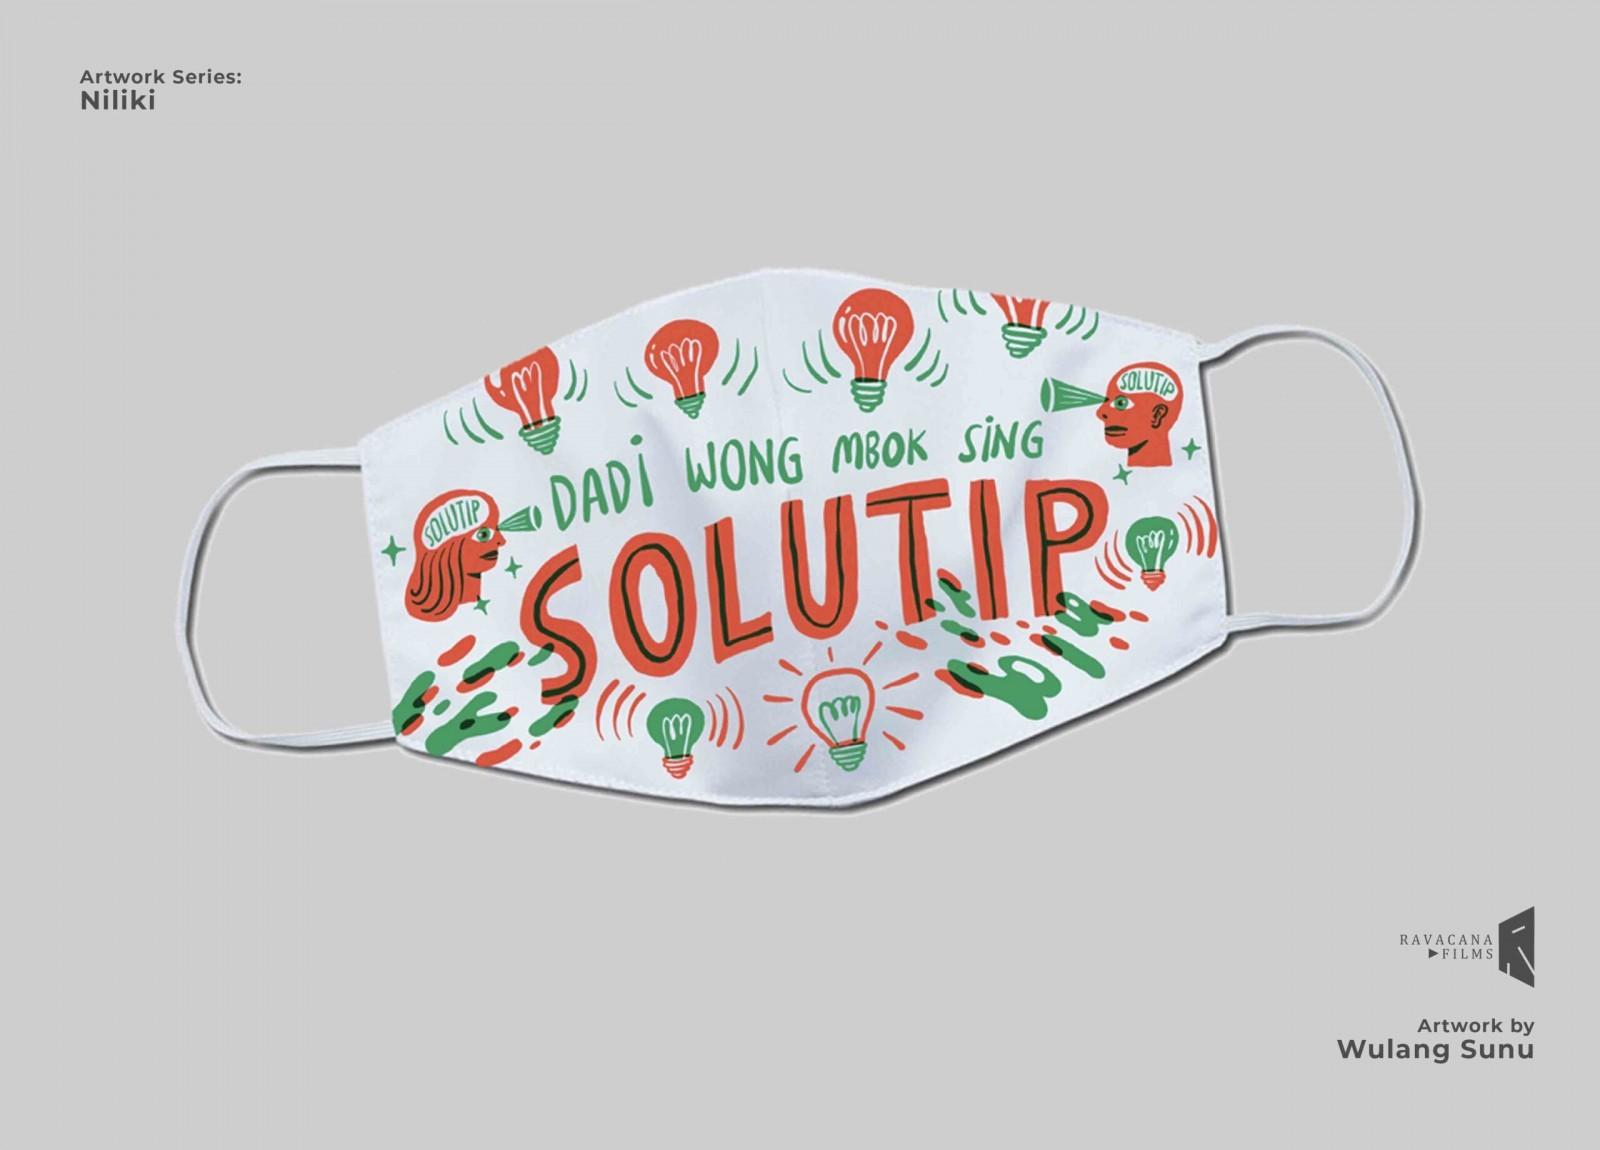 Artwork Series: Niliki – Solutip